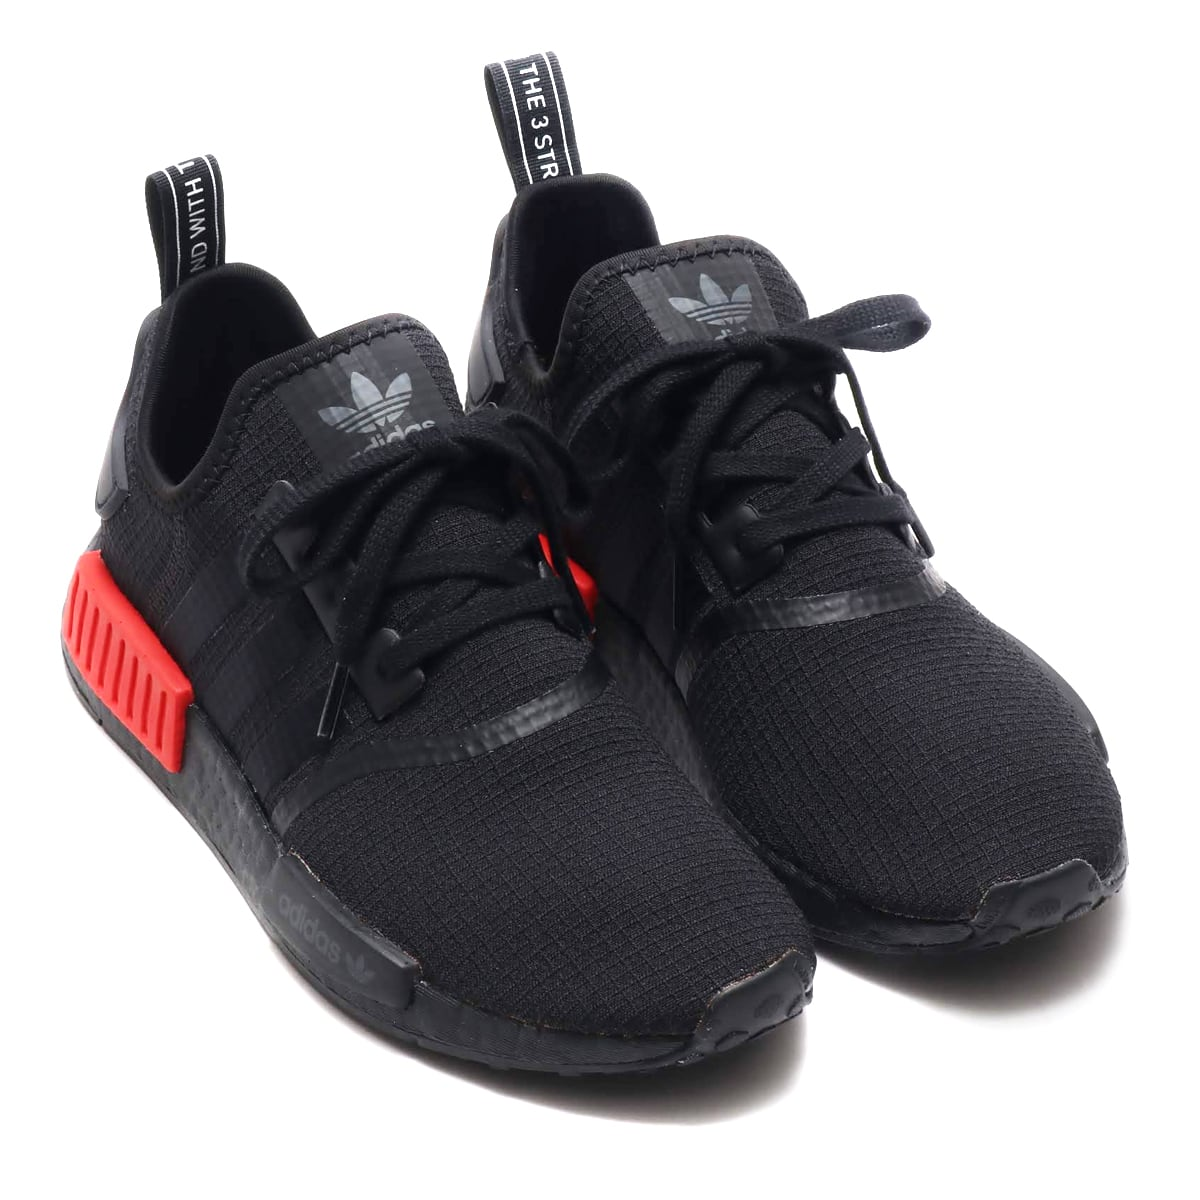 adidas Originals NMD_R1 CORE BLACK/CORE BLACK/RUSH RED゙ 18FW-I_photo_large